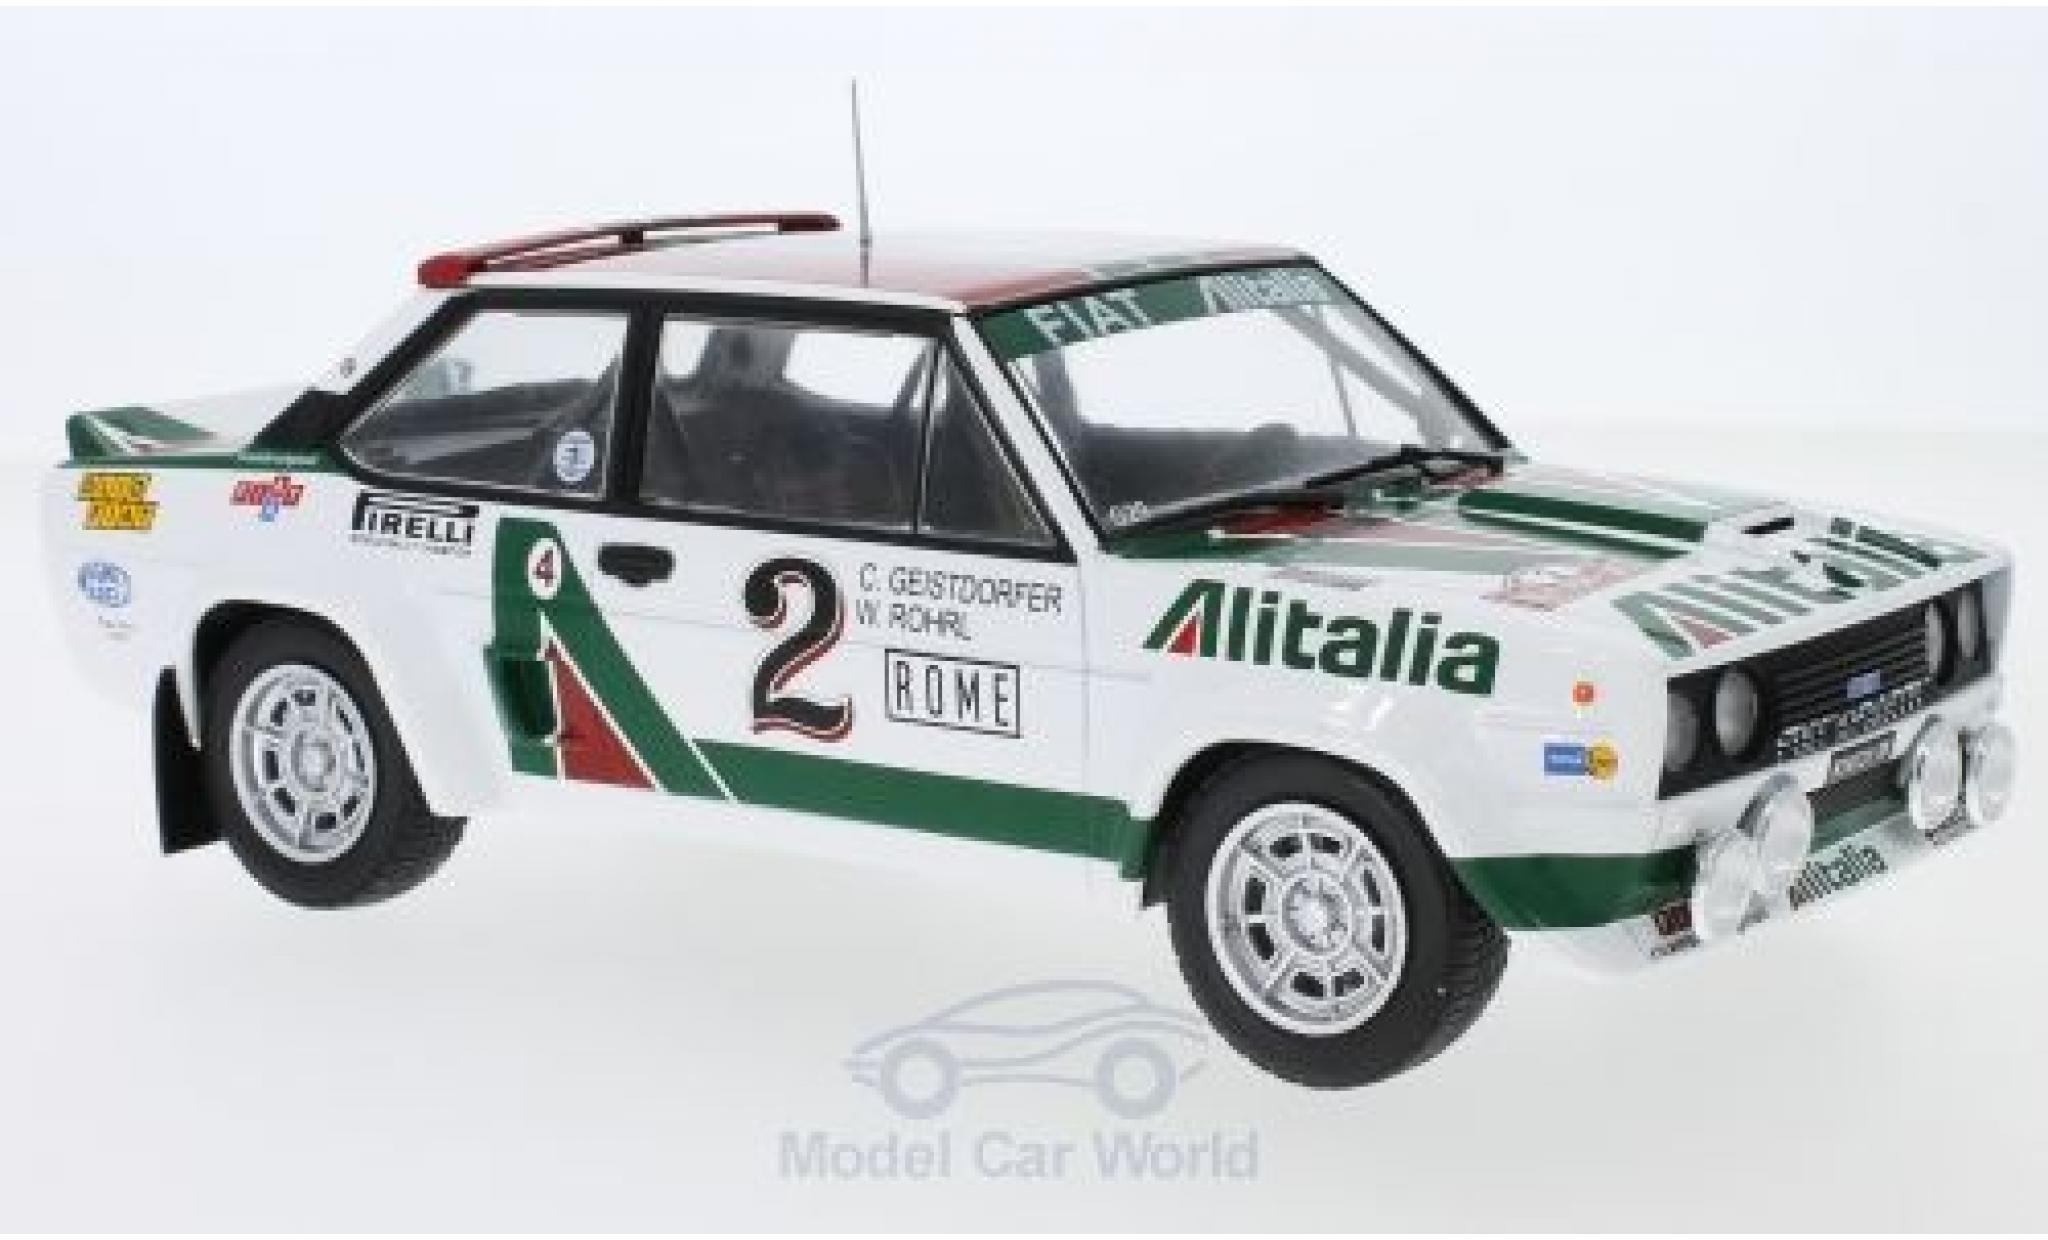 Fiat 131 1/18 IXO Abarth No.2 Alitalia Rallye WM Rally Monte Carlo 1978 W.Röhrl/C.Geistdörfer